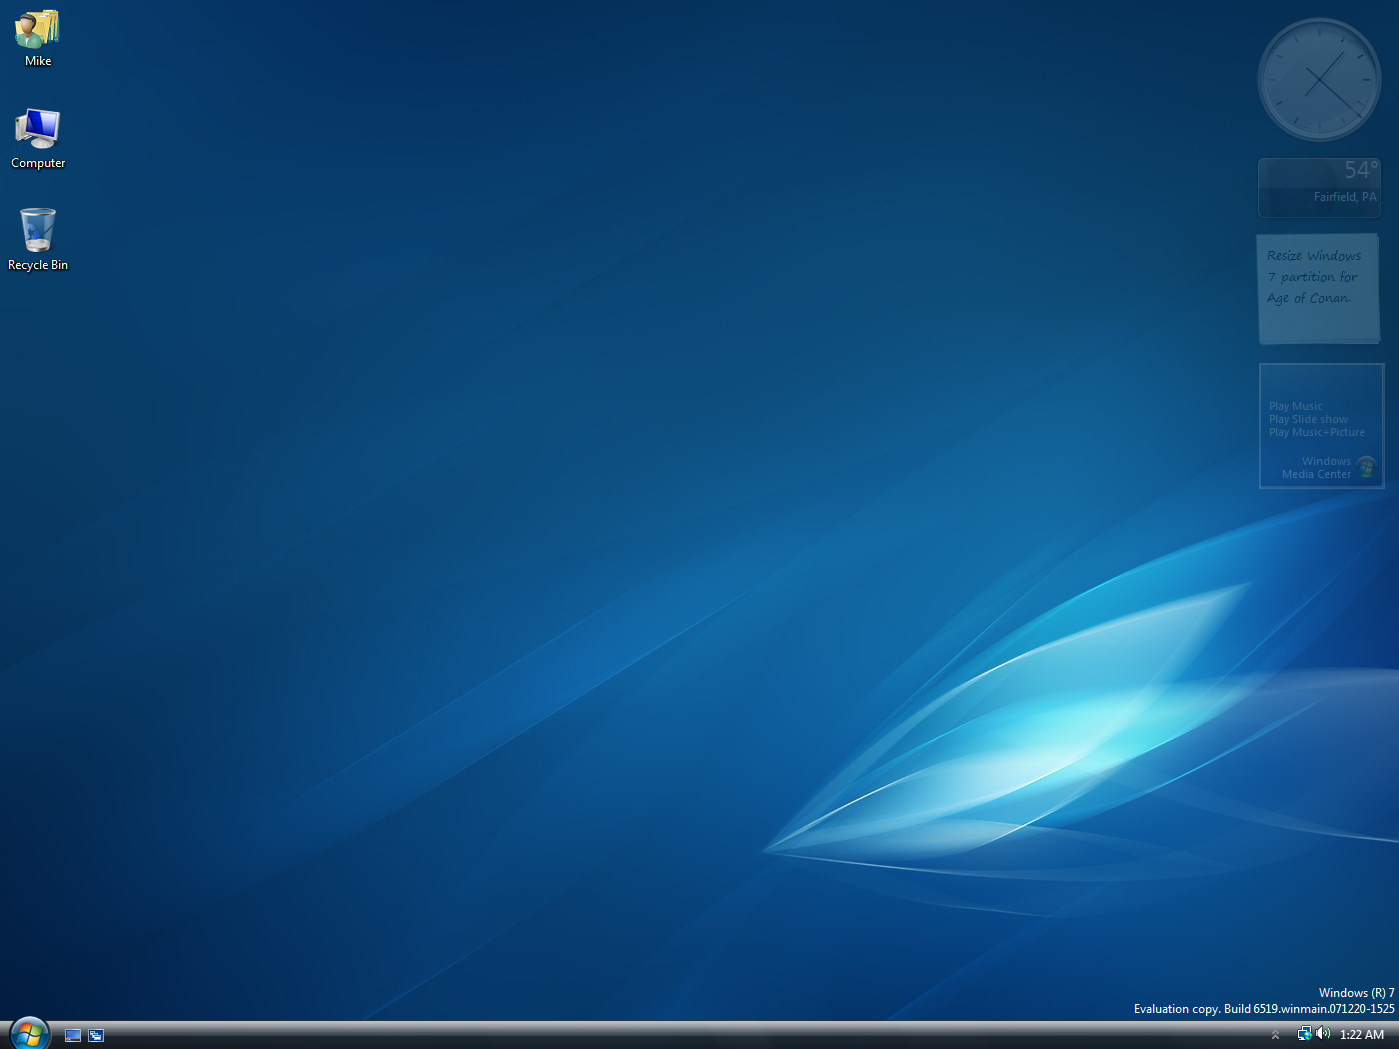 Windows 7 6519 by bishop7